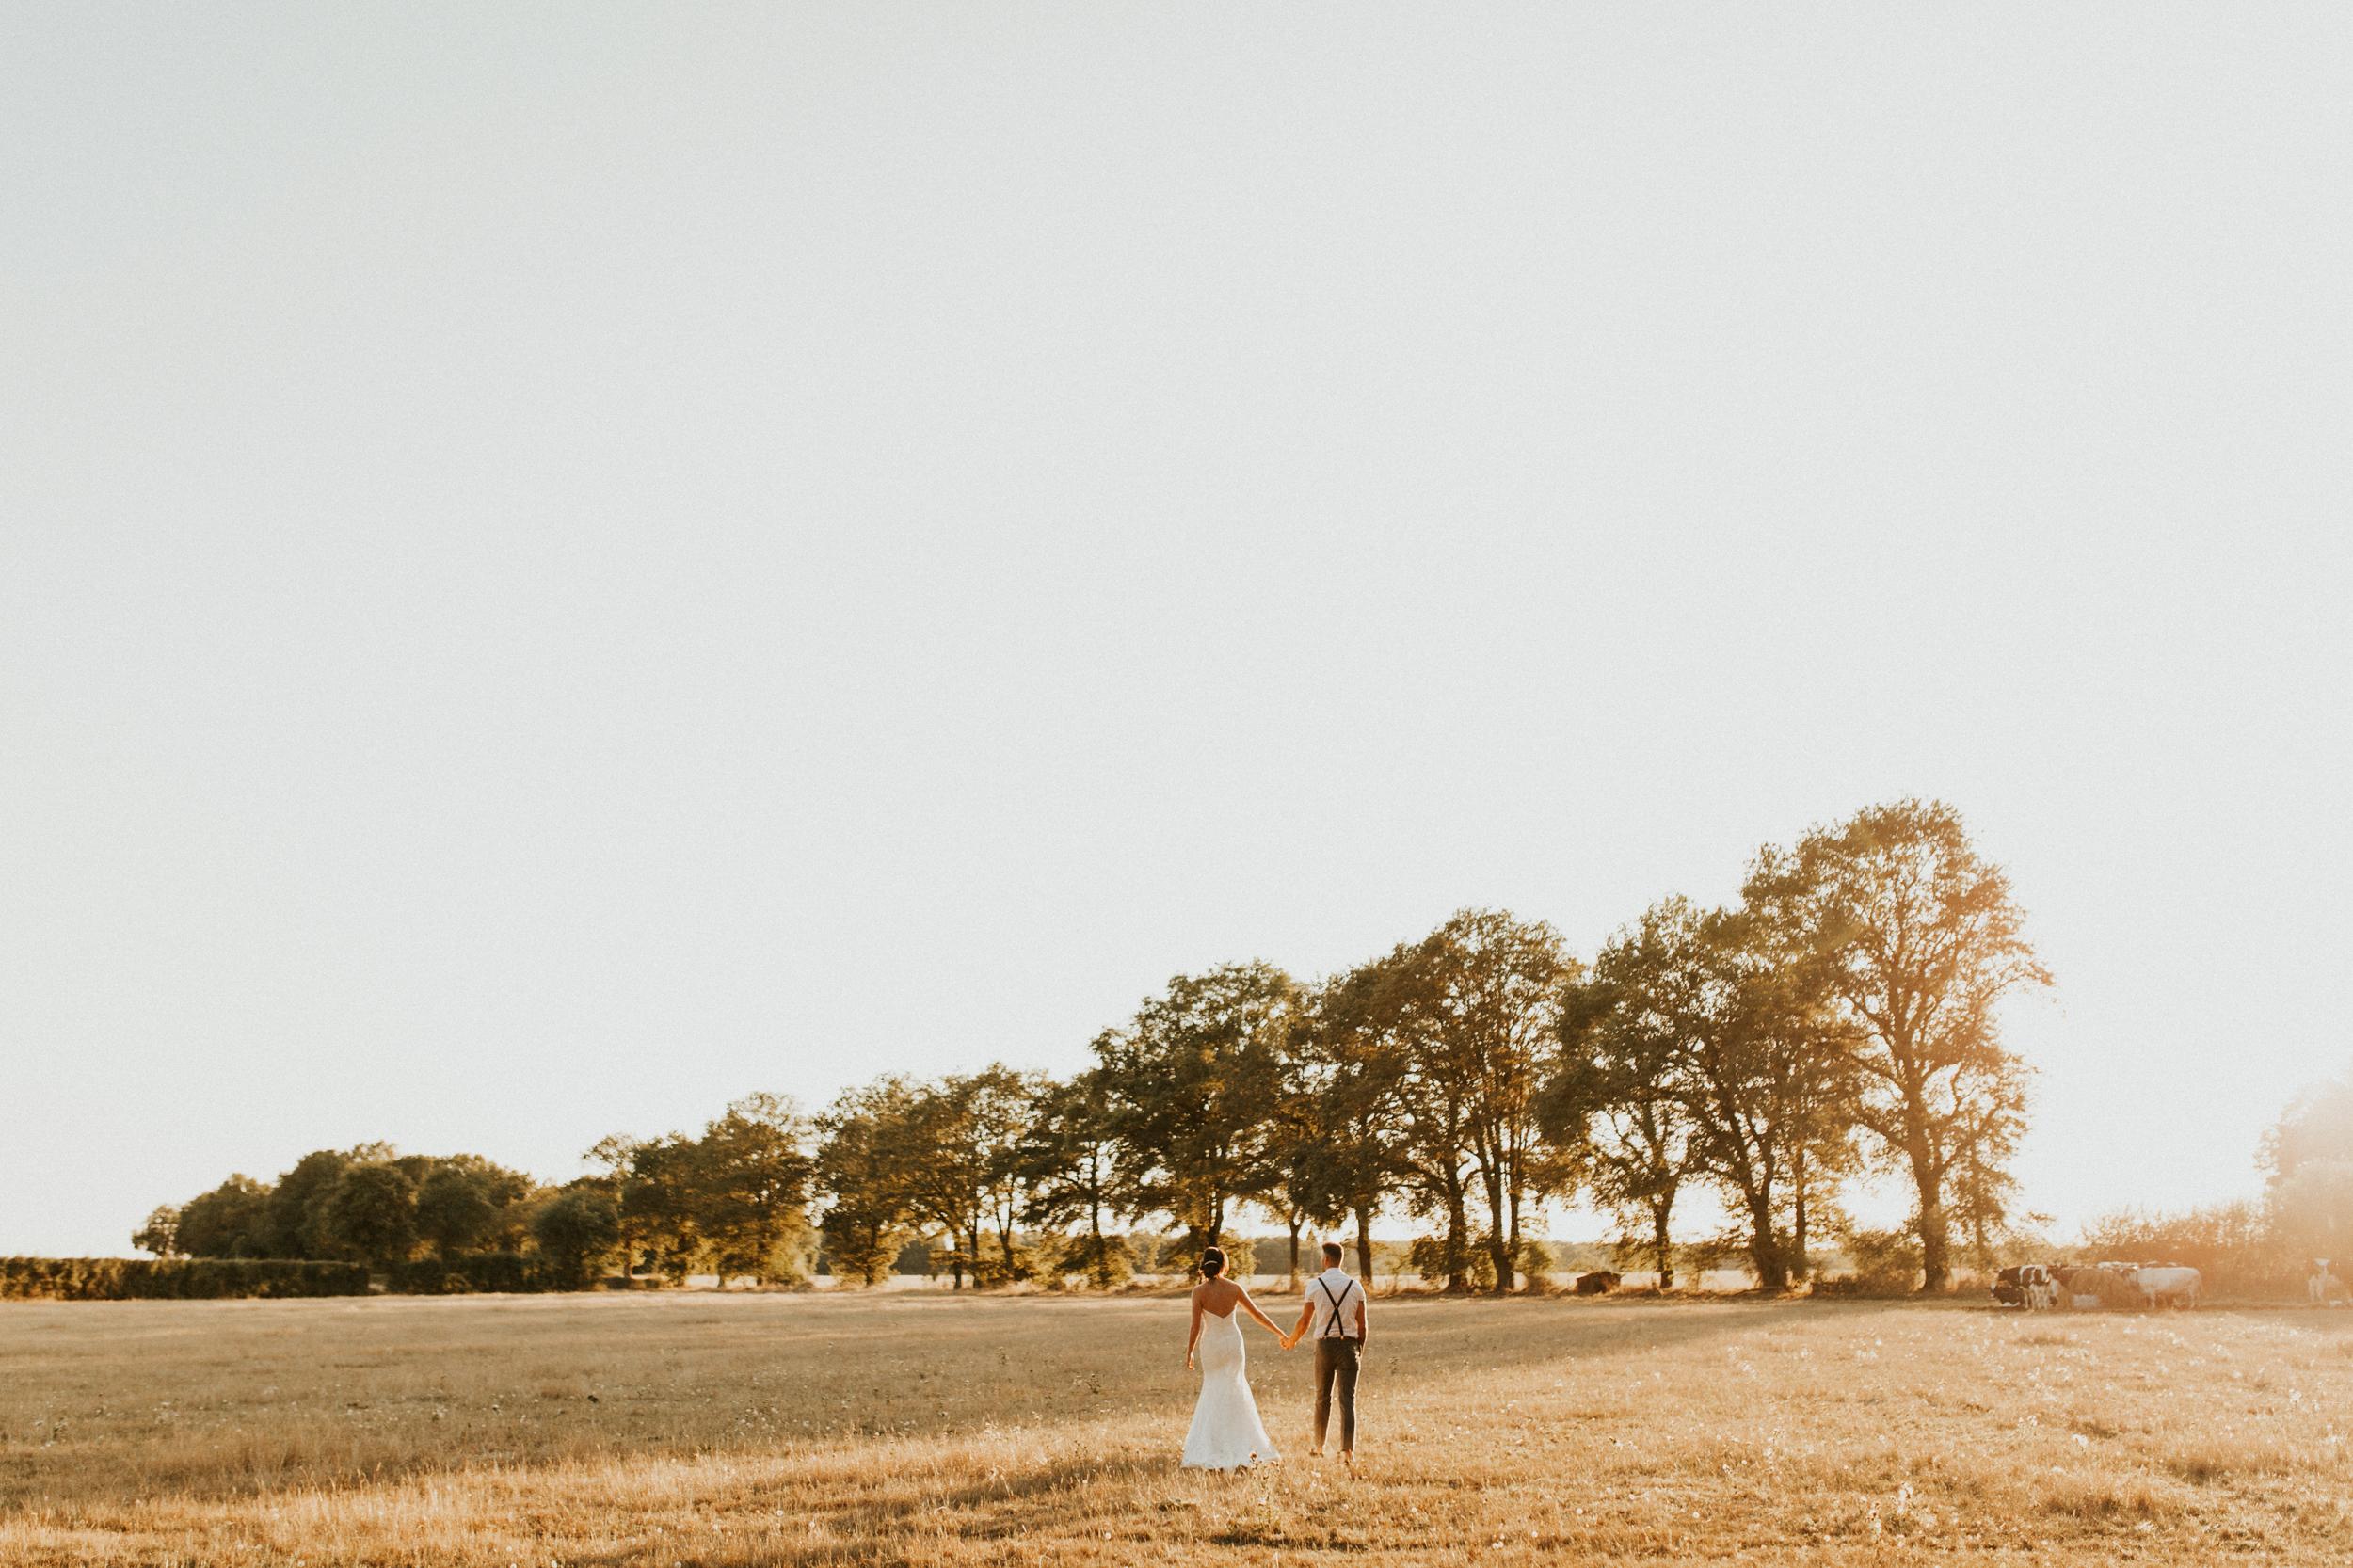 Amy-Zac-Destination-Wedding-France-Manoir-Foulquetiere-Darina-Stoda-Photography-87.jpg